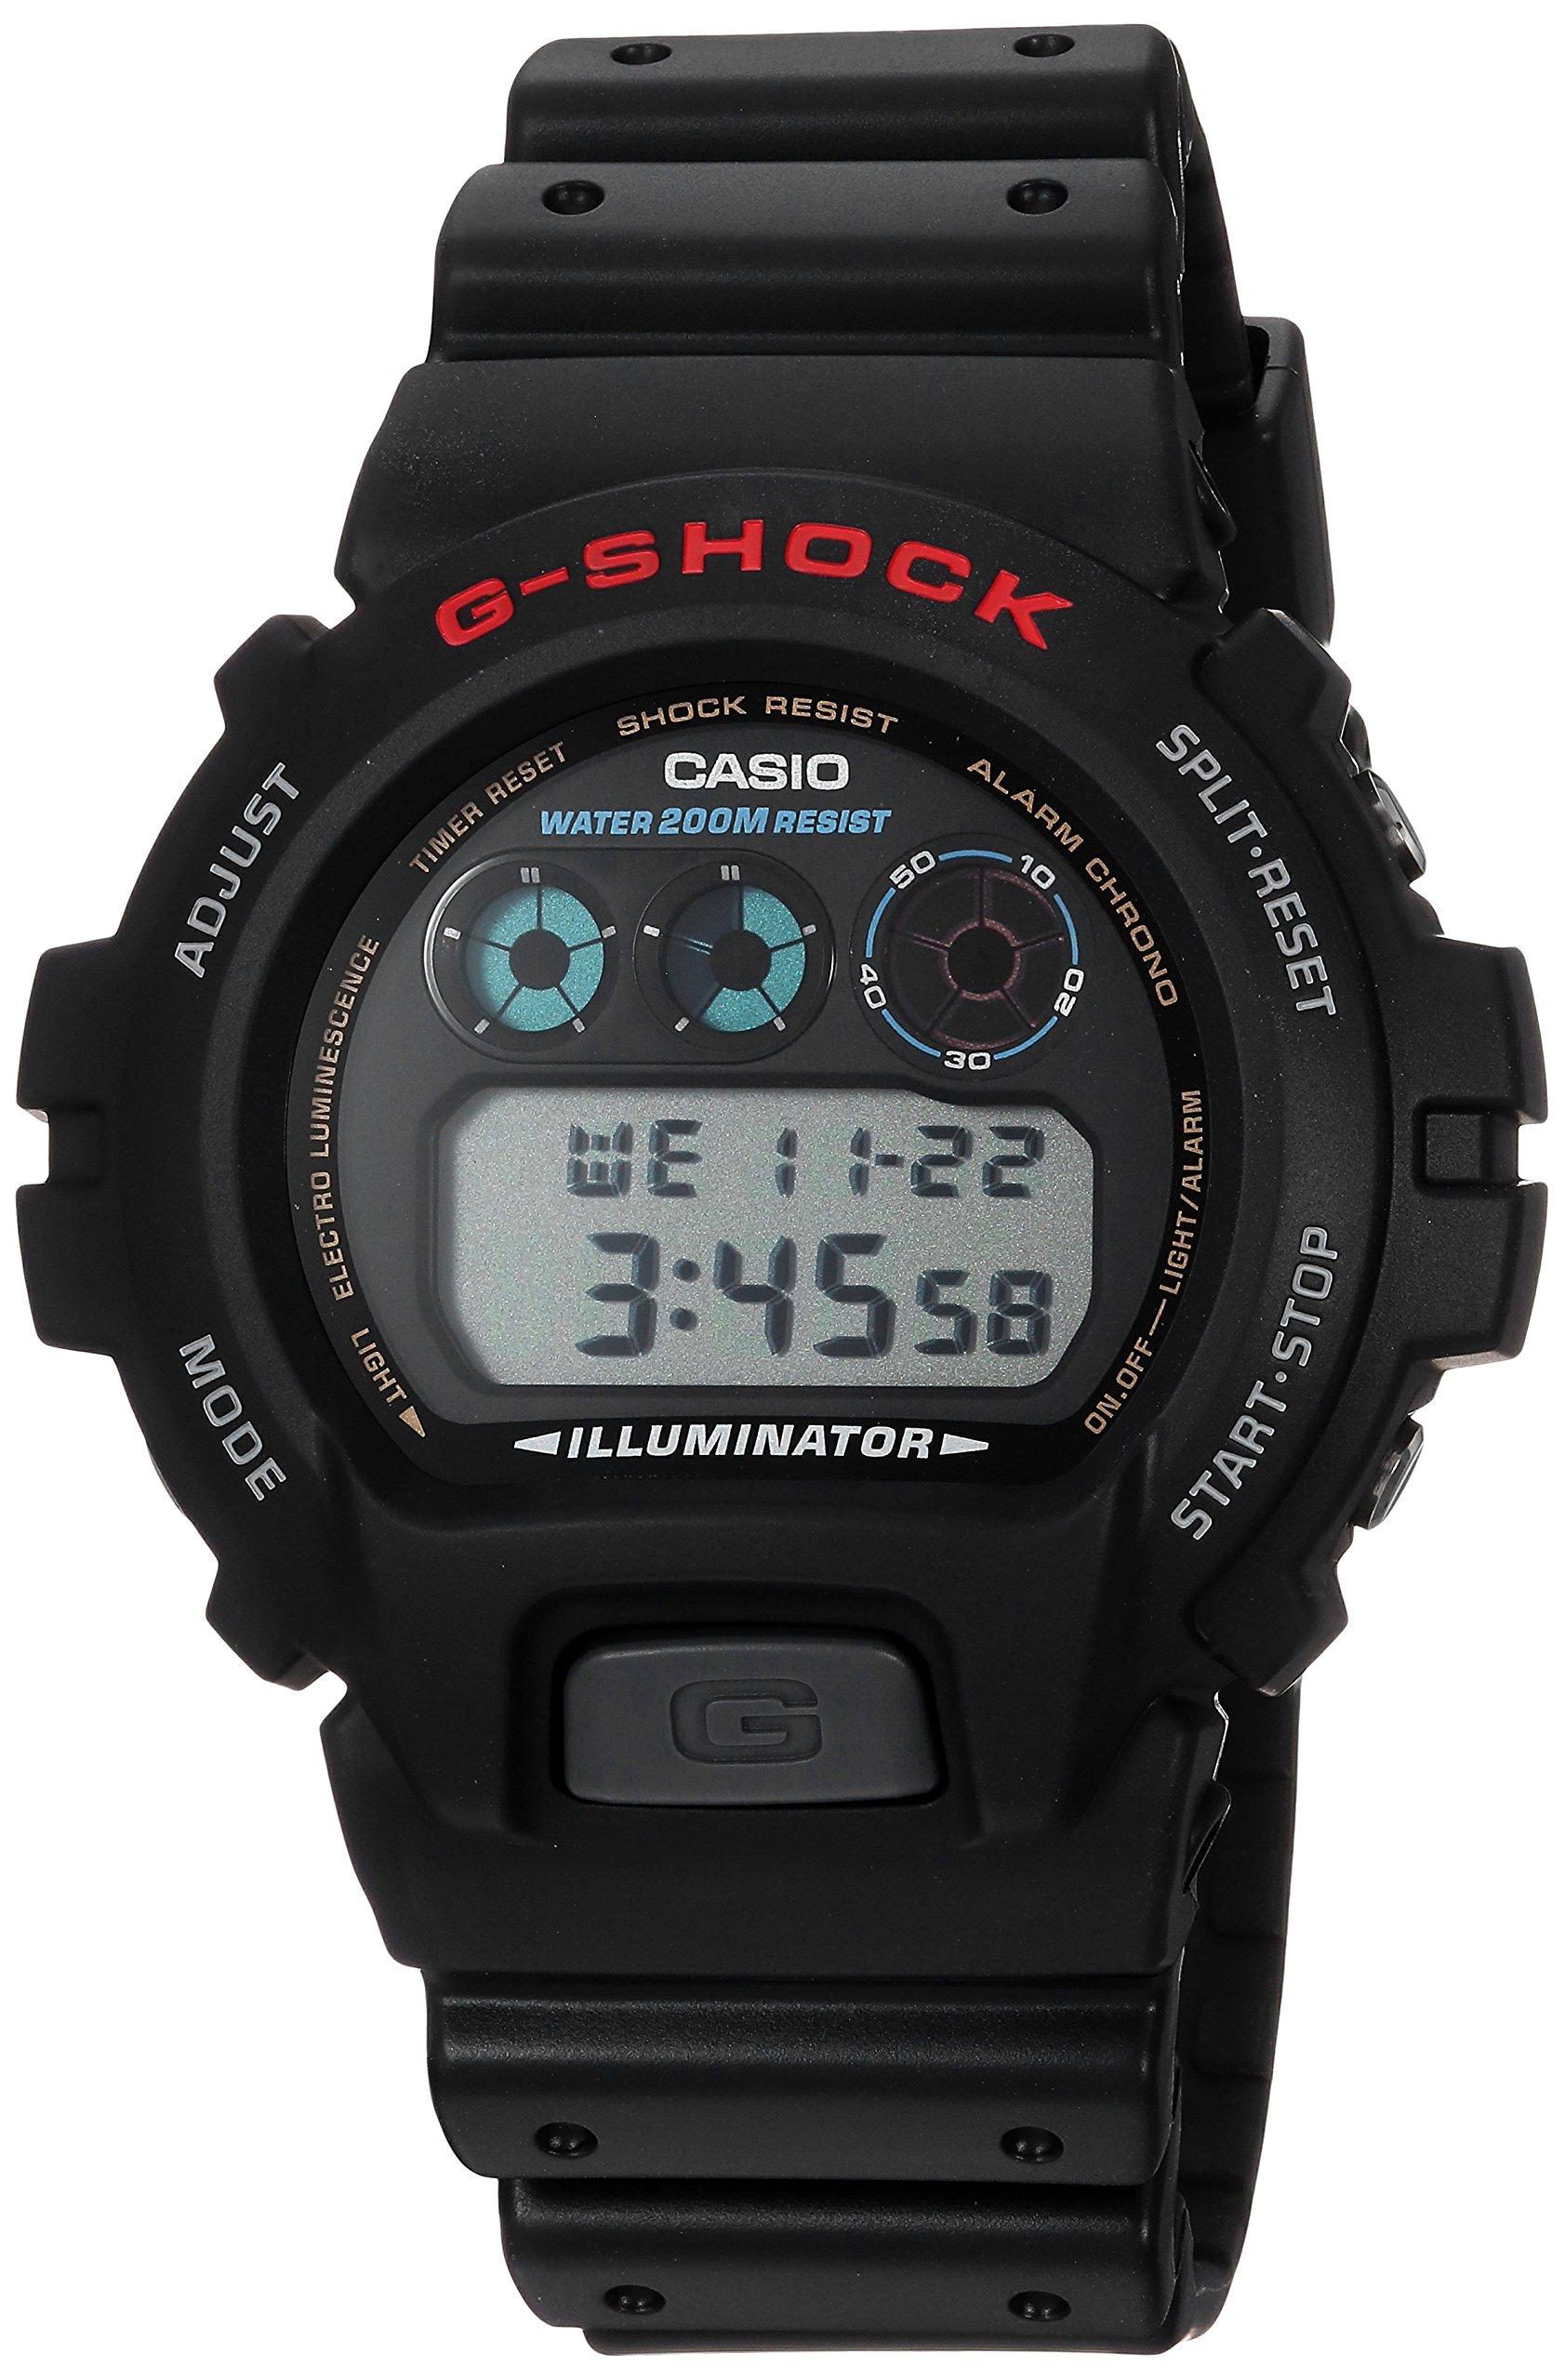 Casio Men's G-Shock DW6900-1V Black Resin Sport Watch by Casio